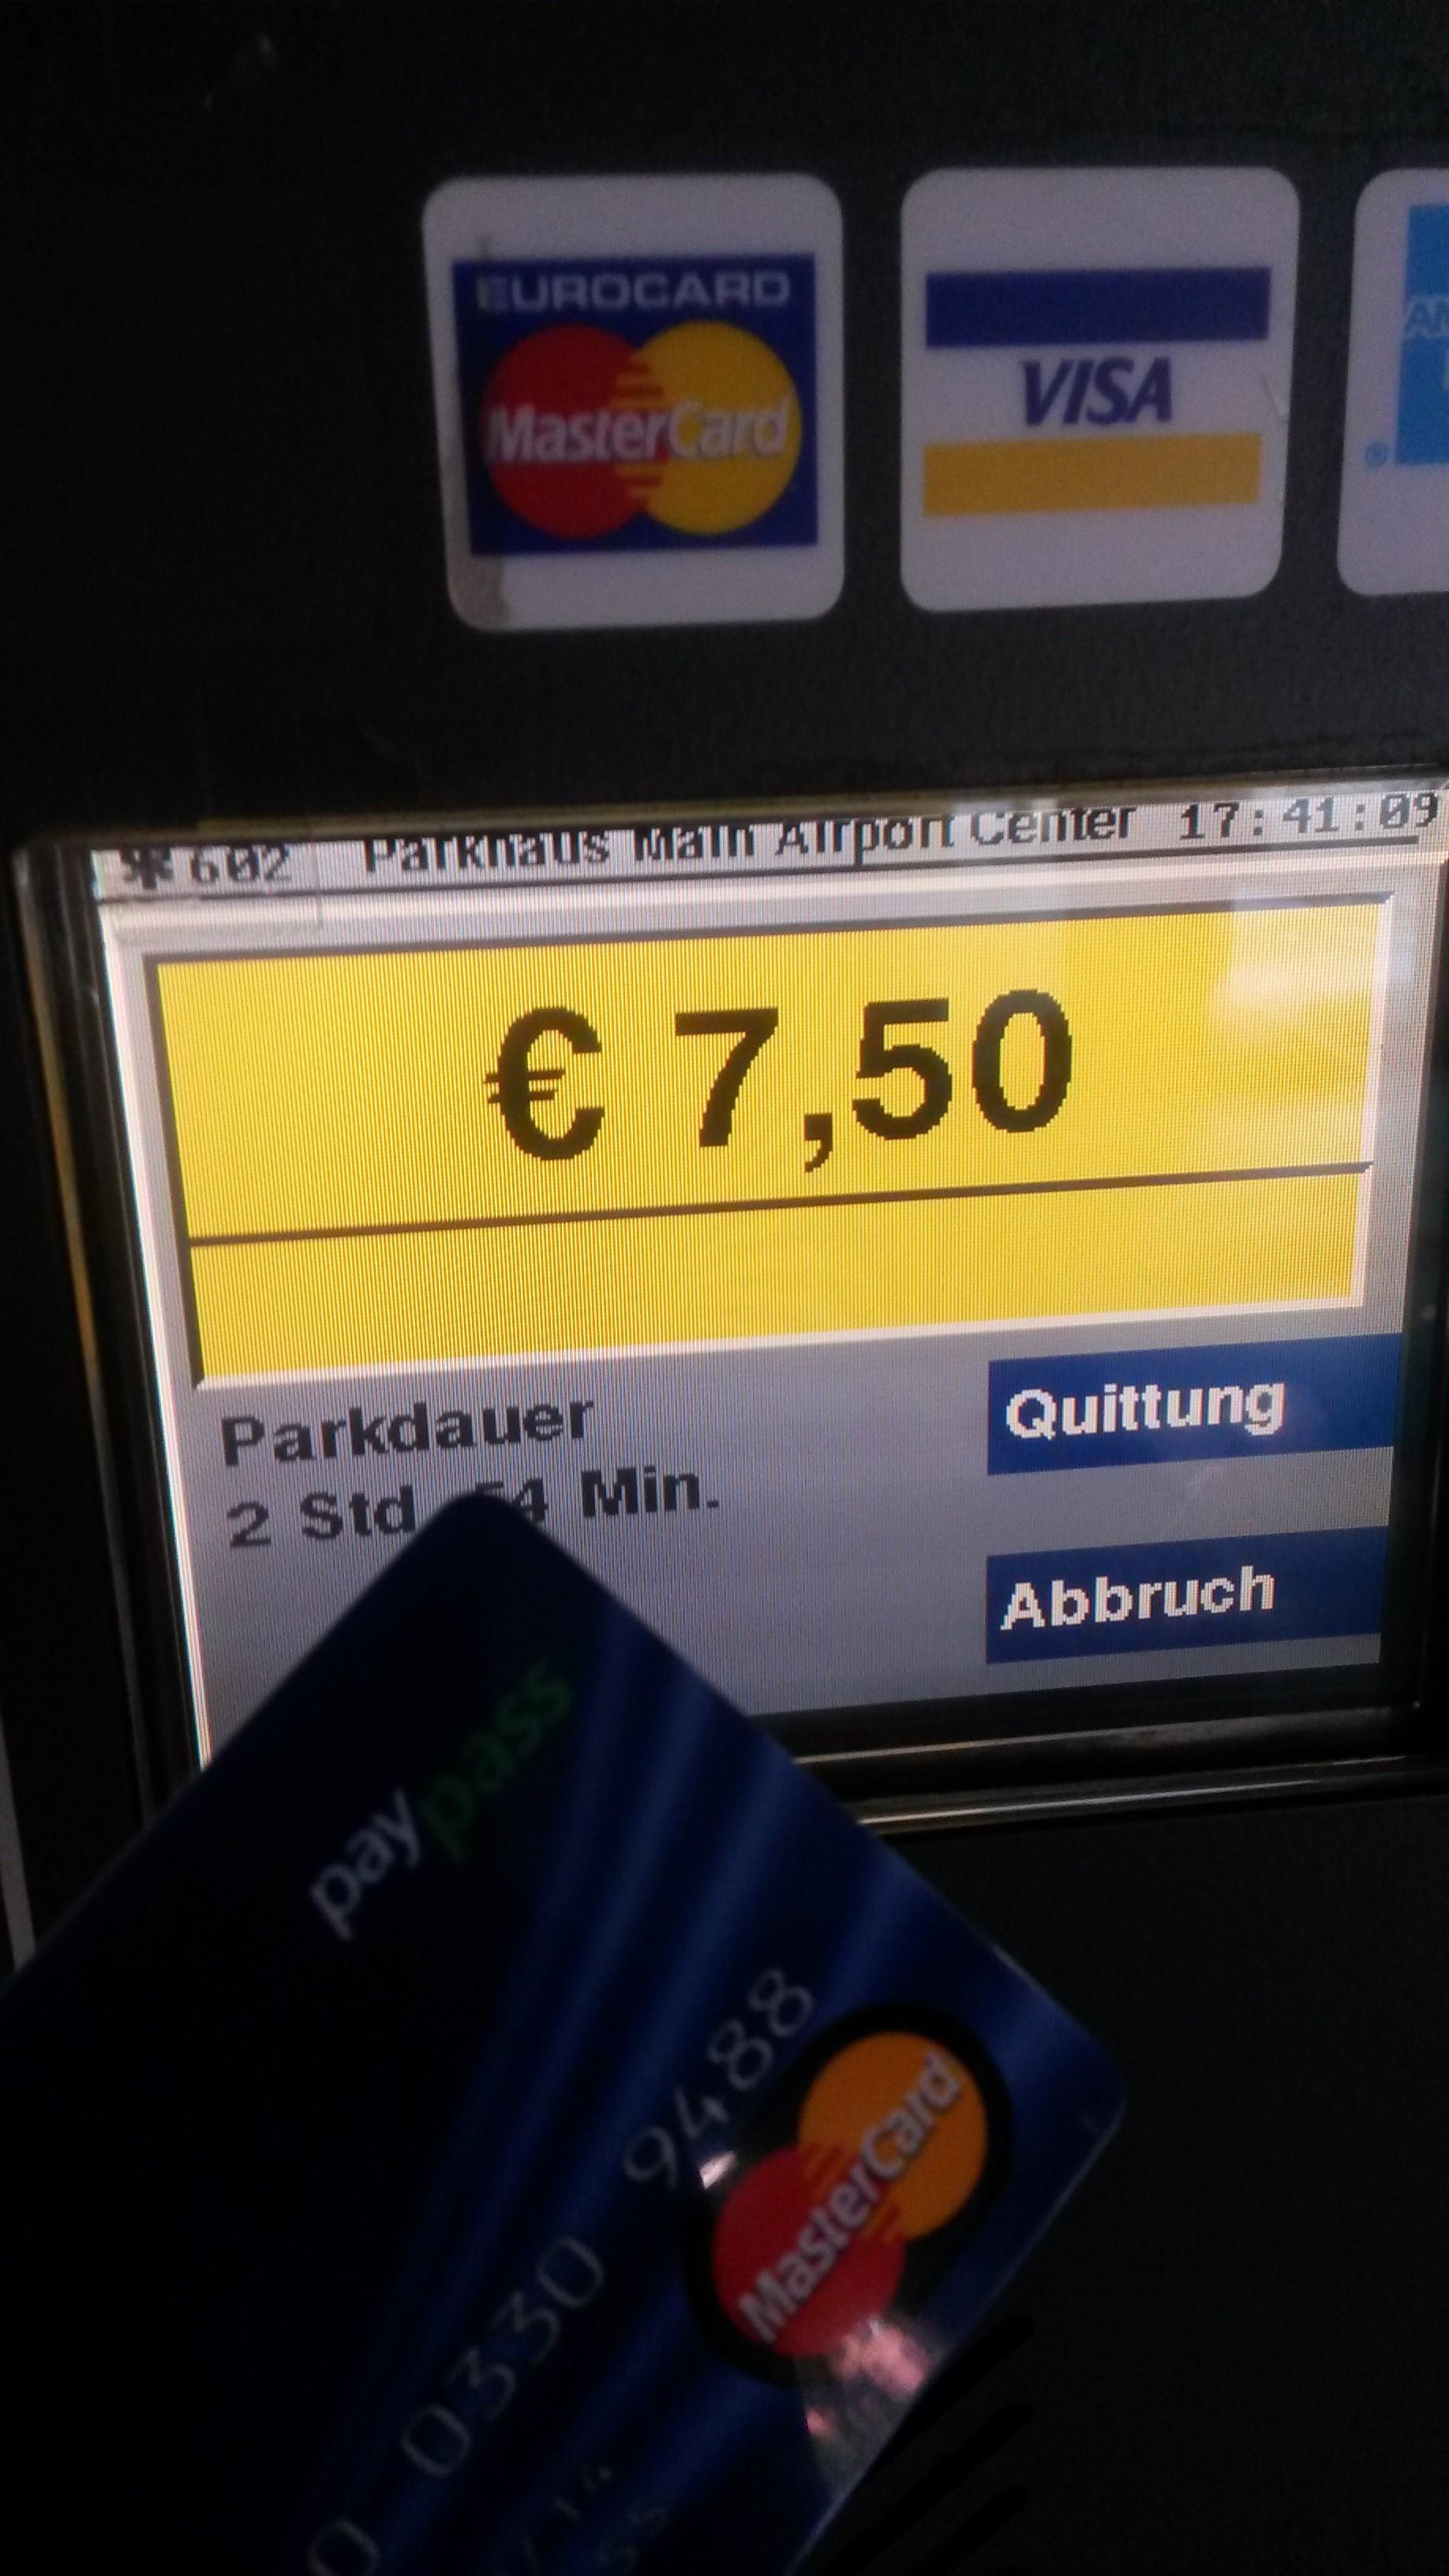 Parkhaus bezahlen mit Mastercard